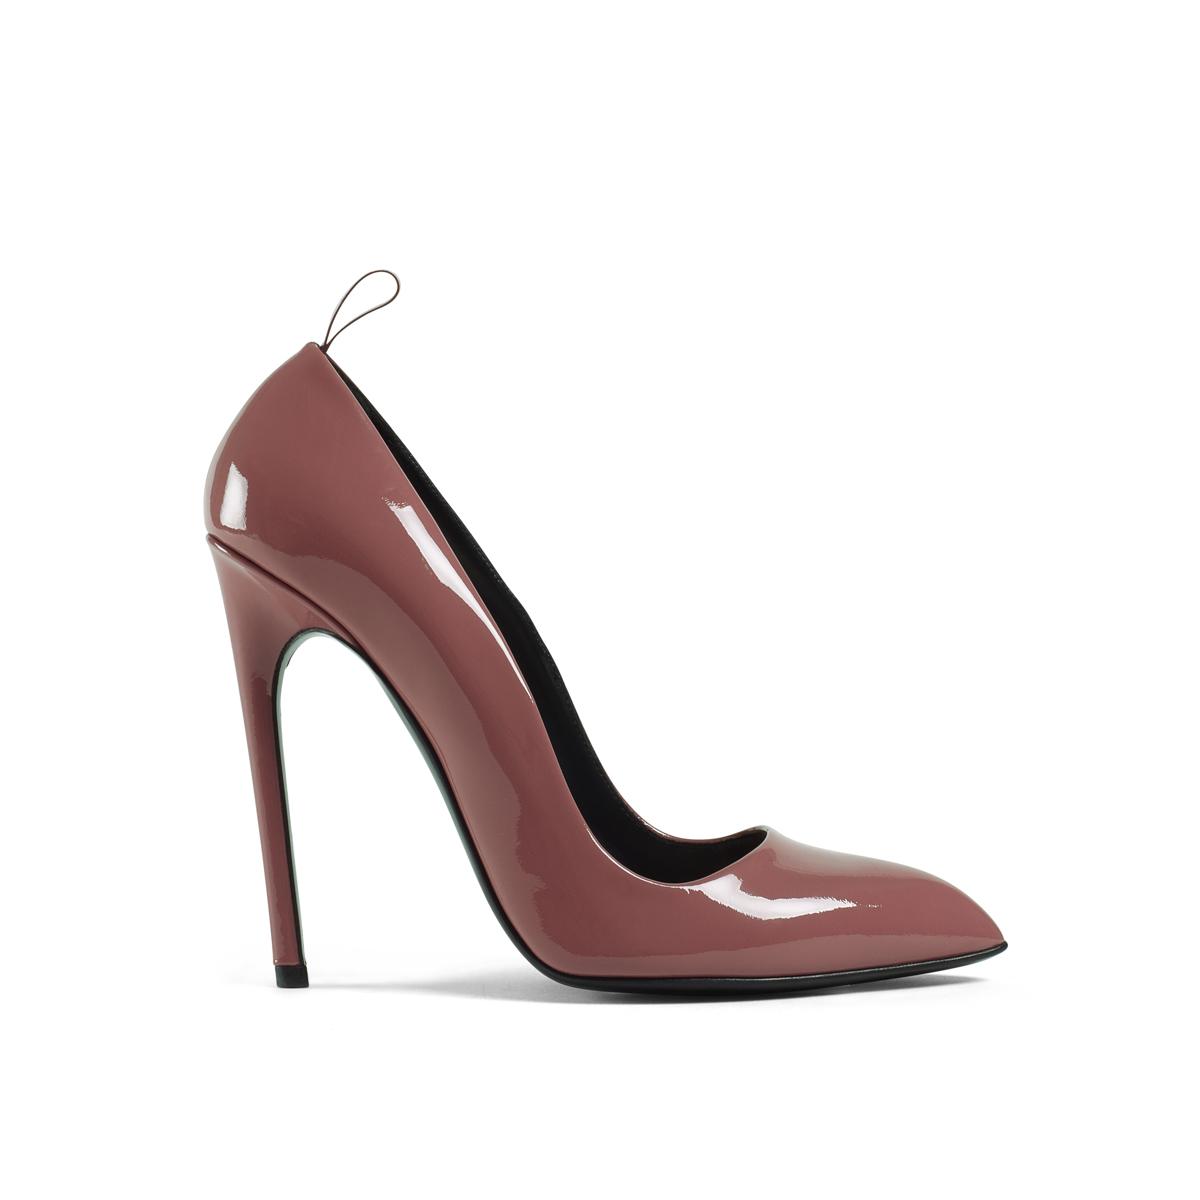 016_alaintondowski_springsummer2017_shoes_3060-120